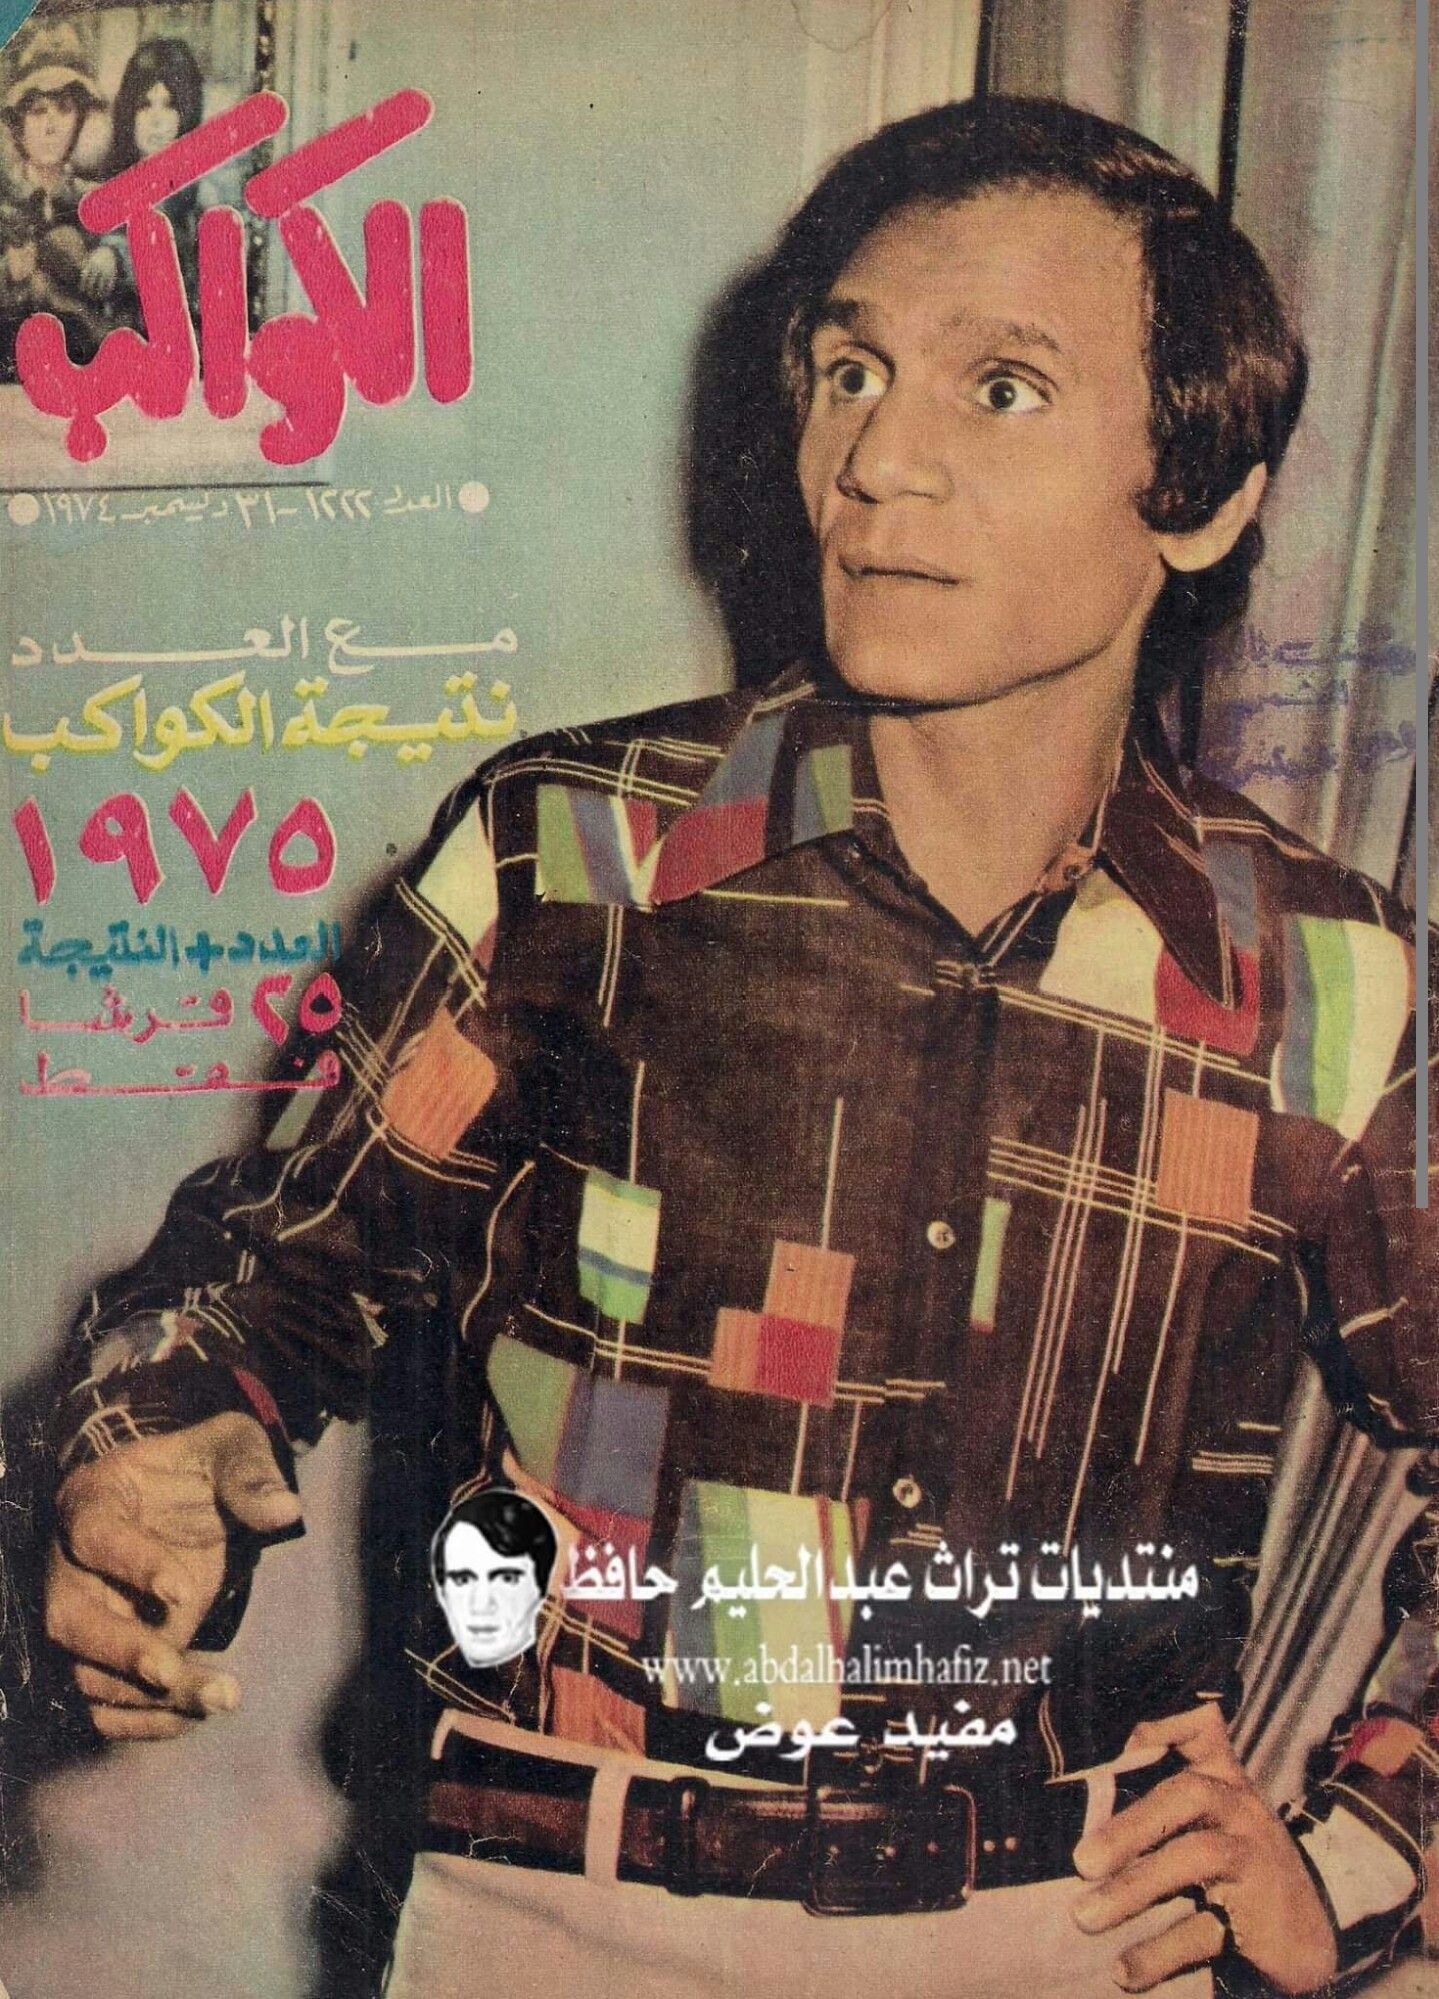 Yousria Yassin Adli Kullanicinin عبد الحليم حافظ حليم Panosundaki Pin